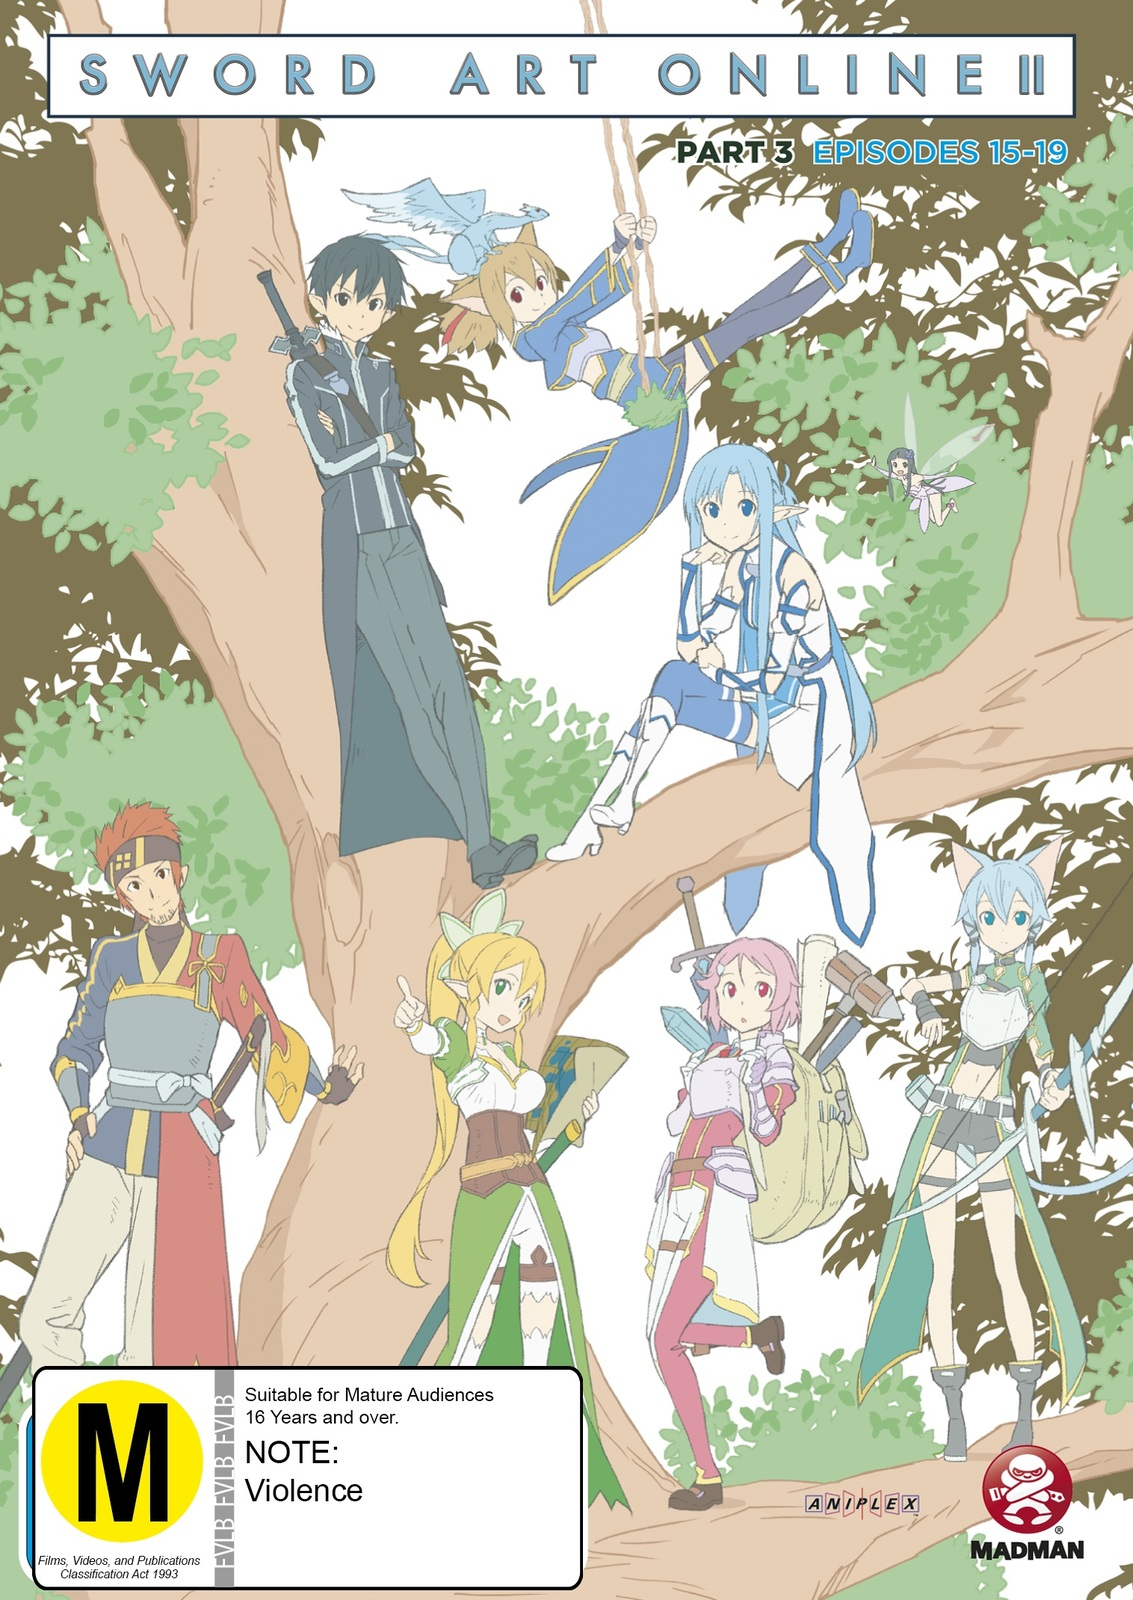 Sword Art Online 2 - Part 3 on DVD image